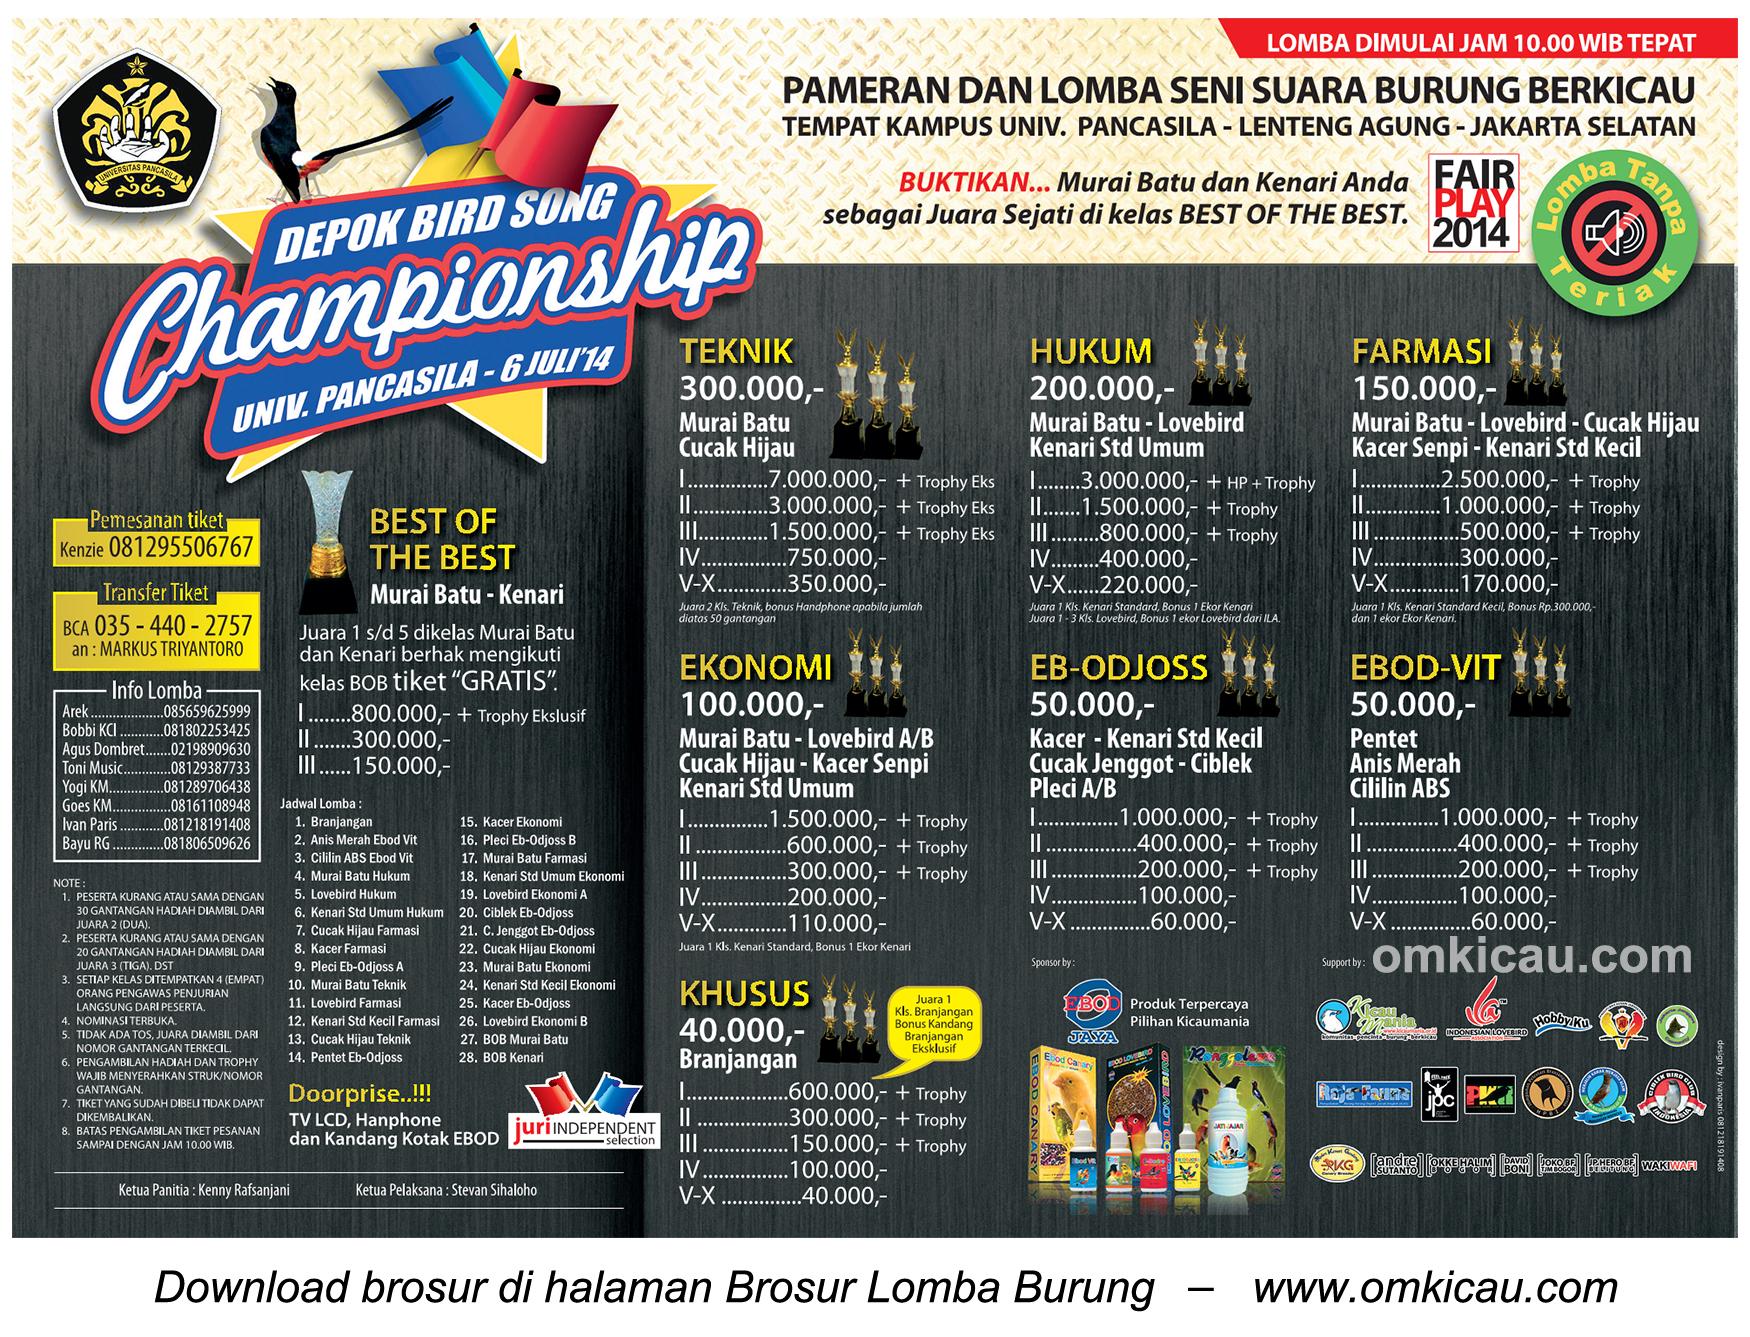 Depok Bird Song Championship 6 Juli 2014